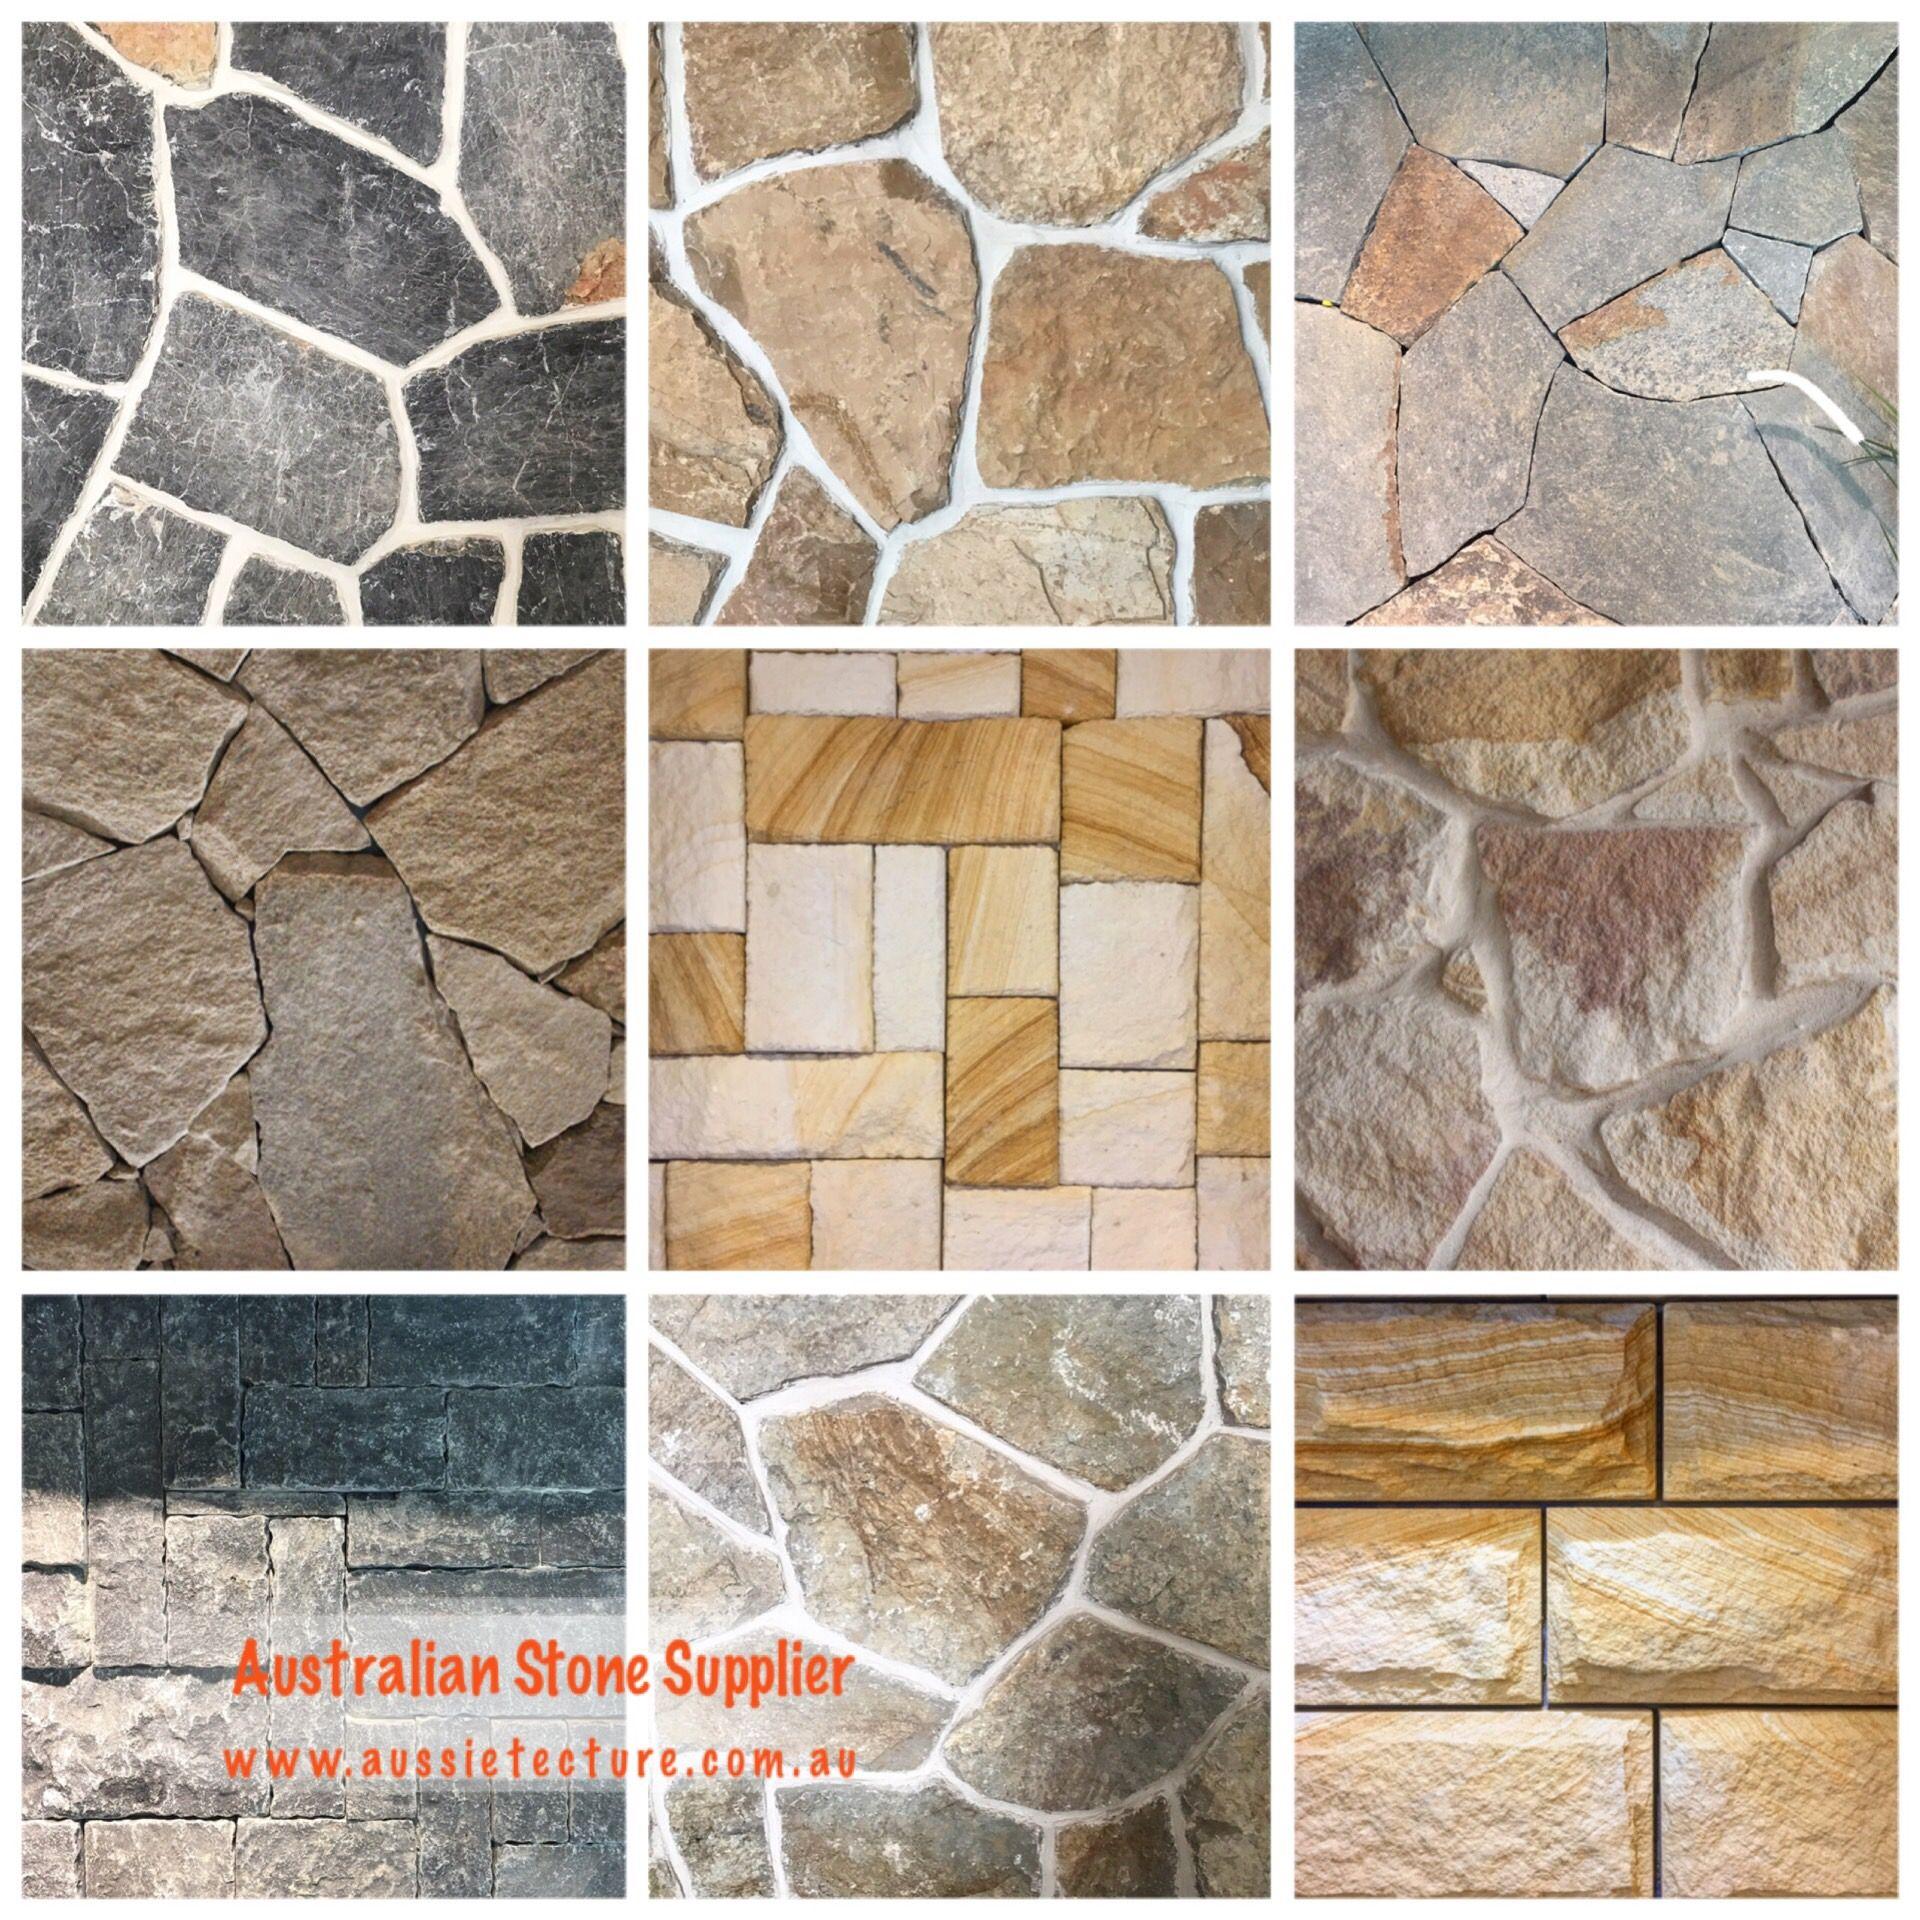 Stone Wall Stone Cladding Stone Walls Stone Walling Sone Wall Cladding Sandstone Stone Clad Stone Cladding Exterior Stone Cladding Natural Stone Cladding